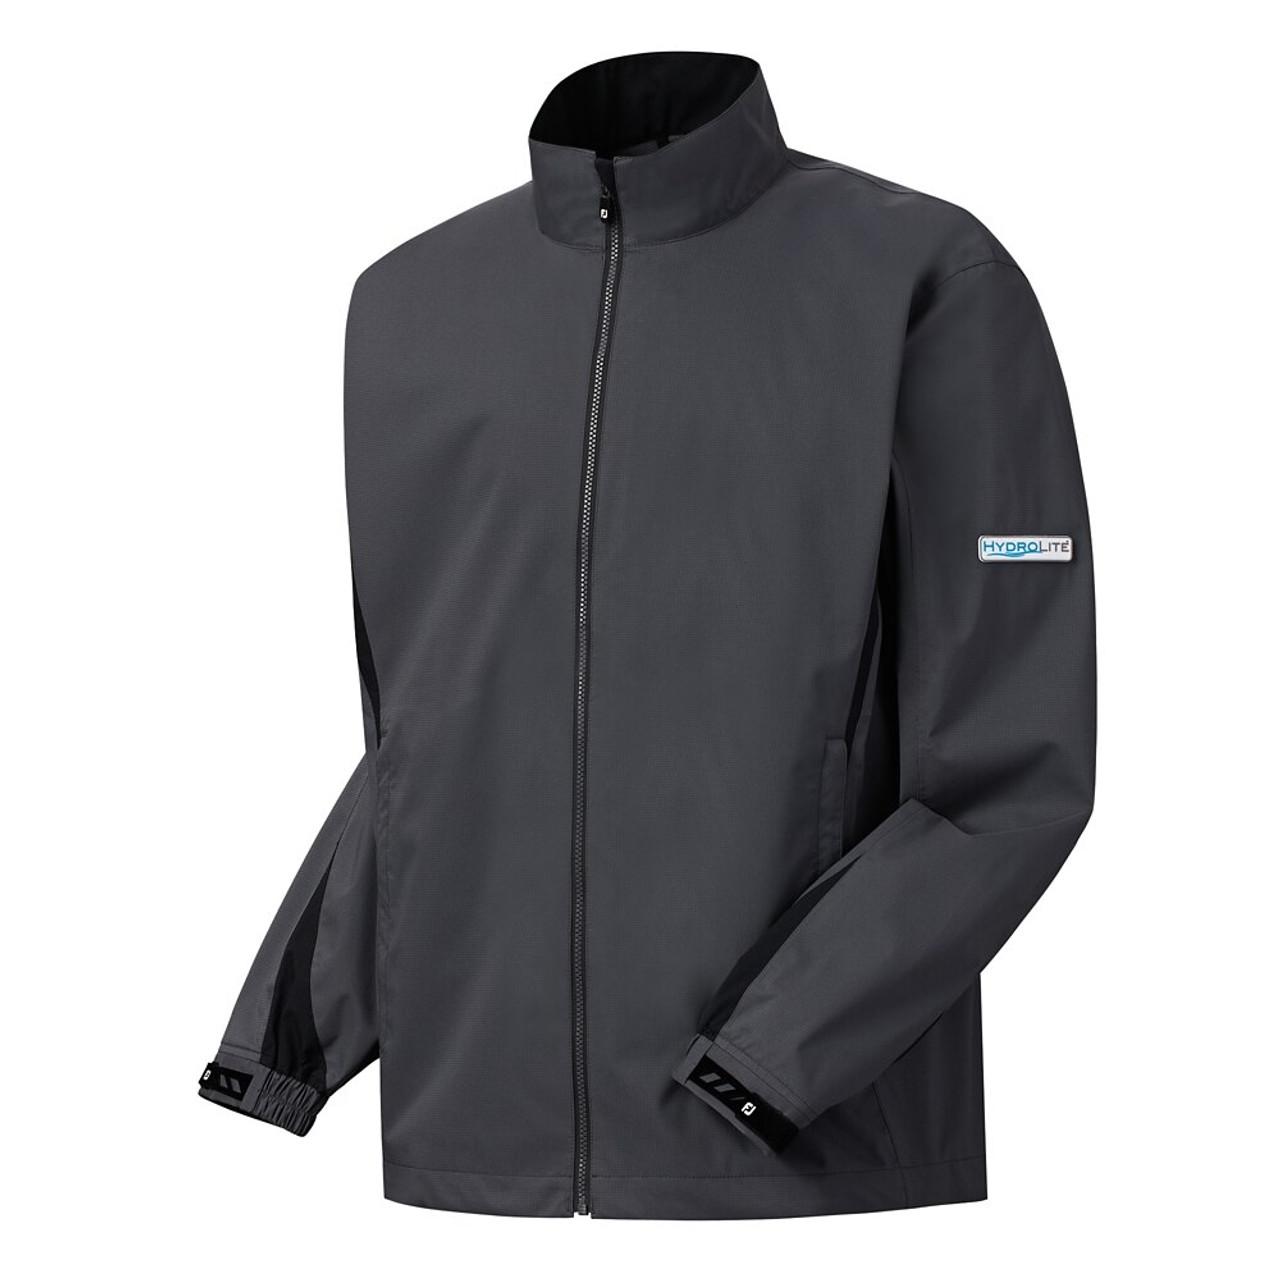 FootJoy FJ Hydrolite Rain Jacket - Charcoal / Black (23787)